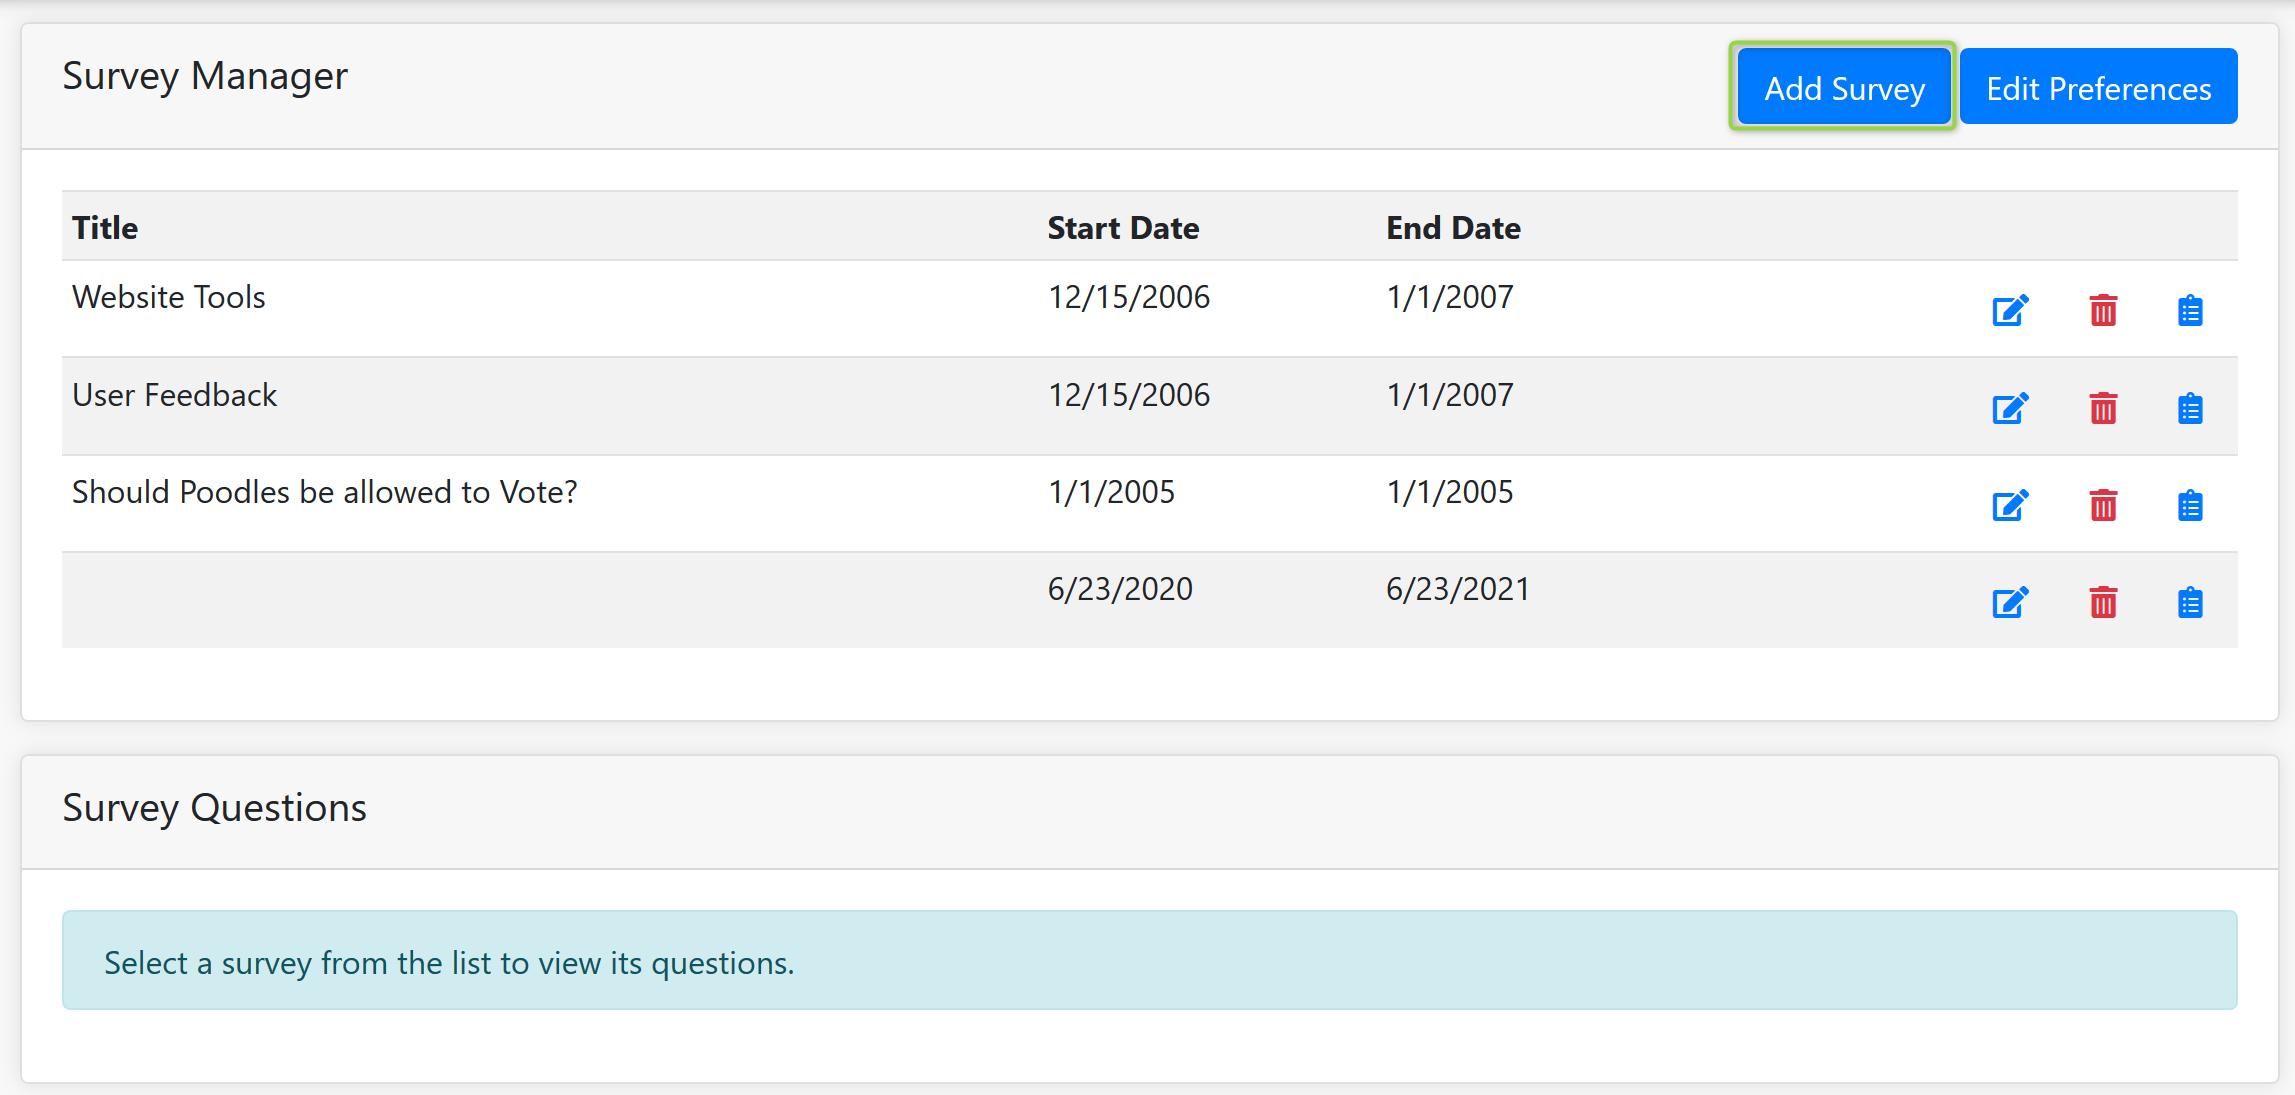 Survey Manager Screenshot